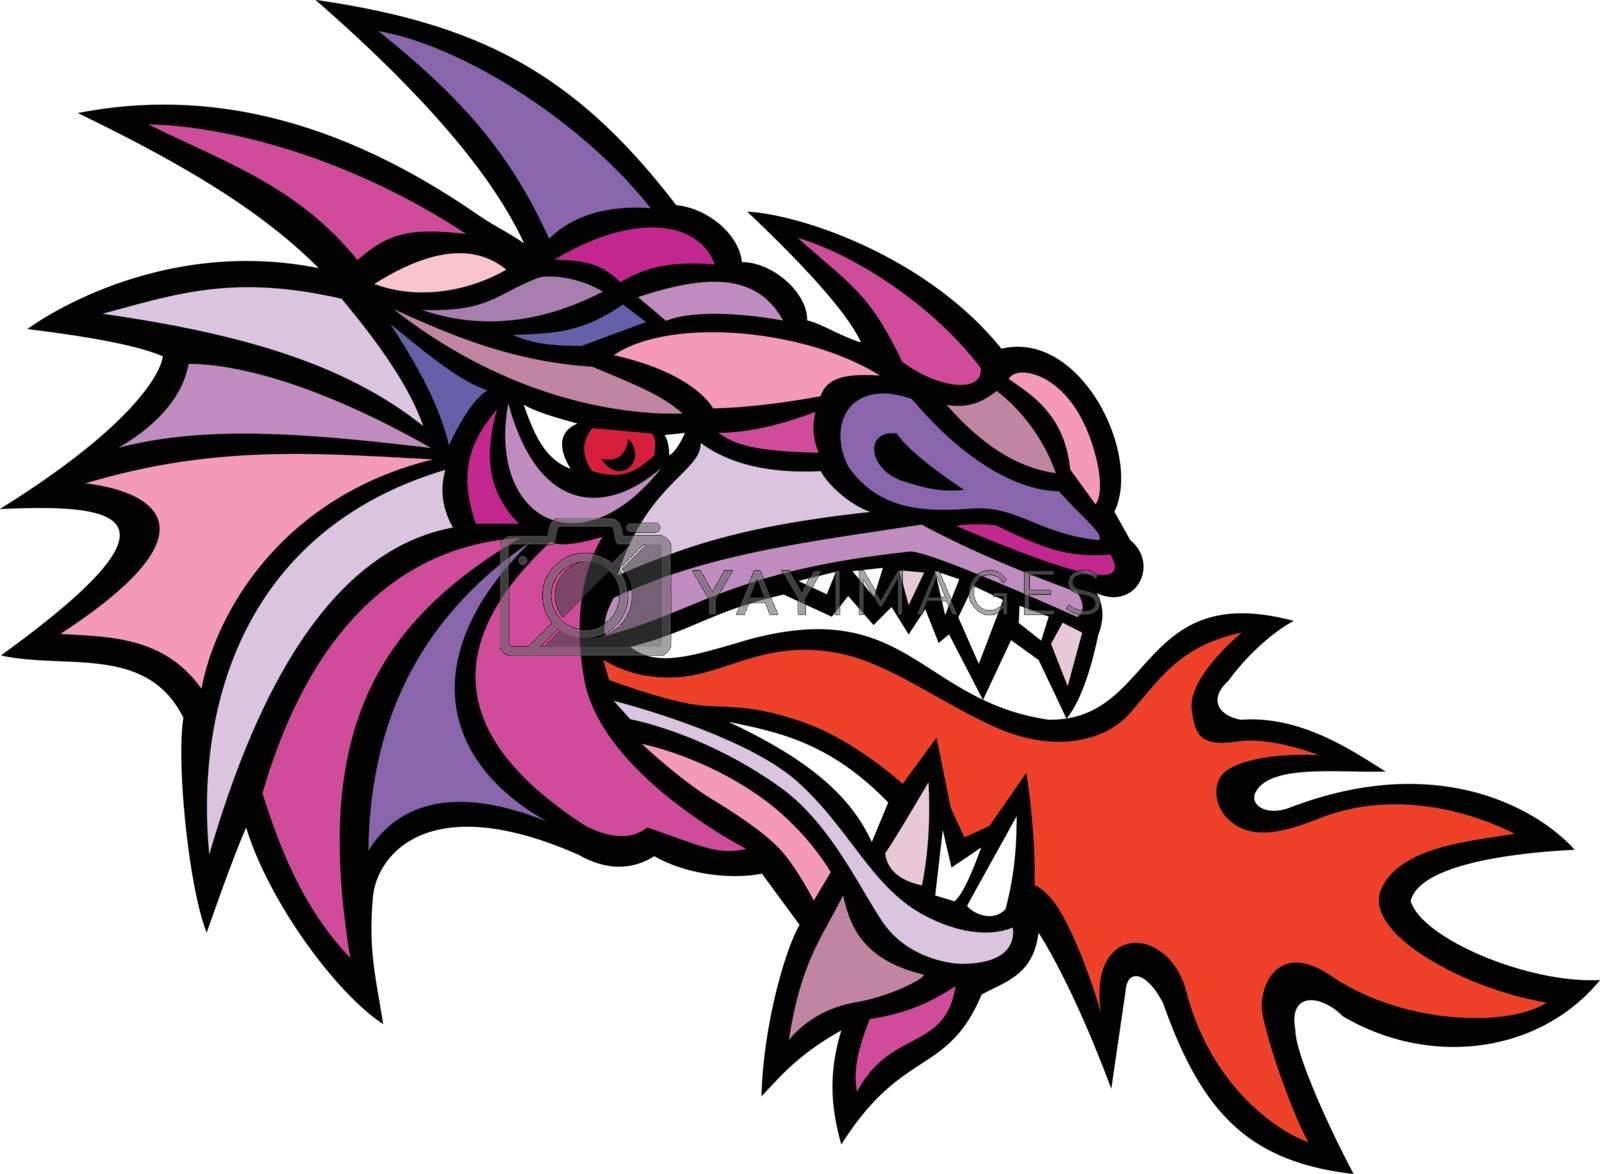 Mosaic Mythical Dragon Breathing Fire Mascot by patrimonio